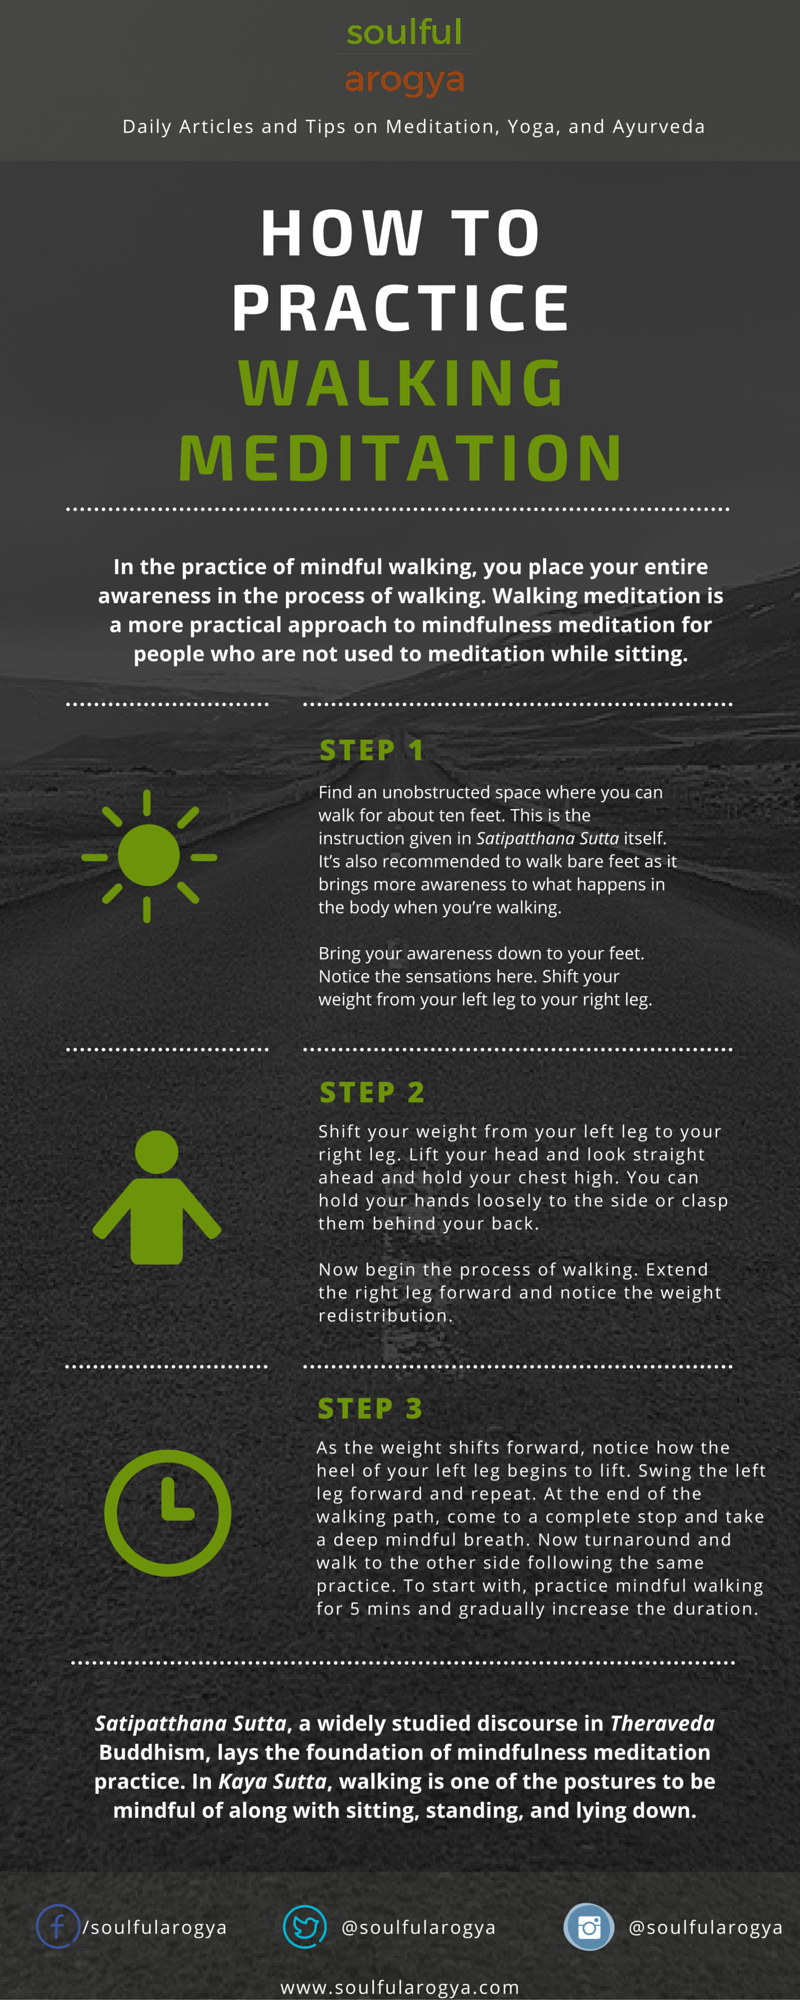 How-to-Practice-Walking-Meditation-Infographic-lkrllc